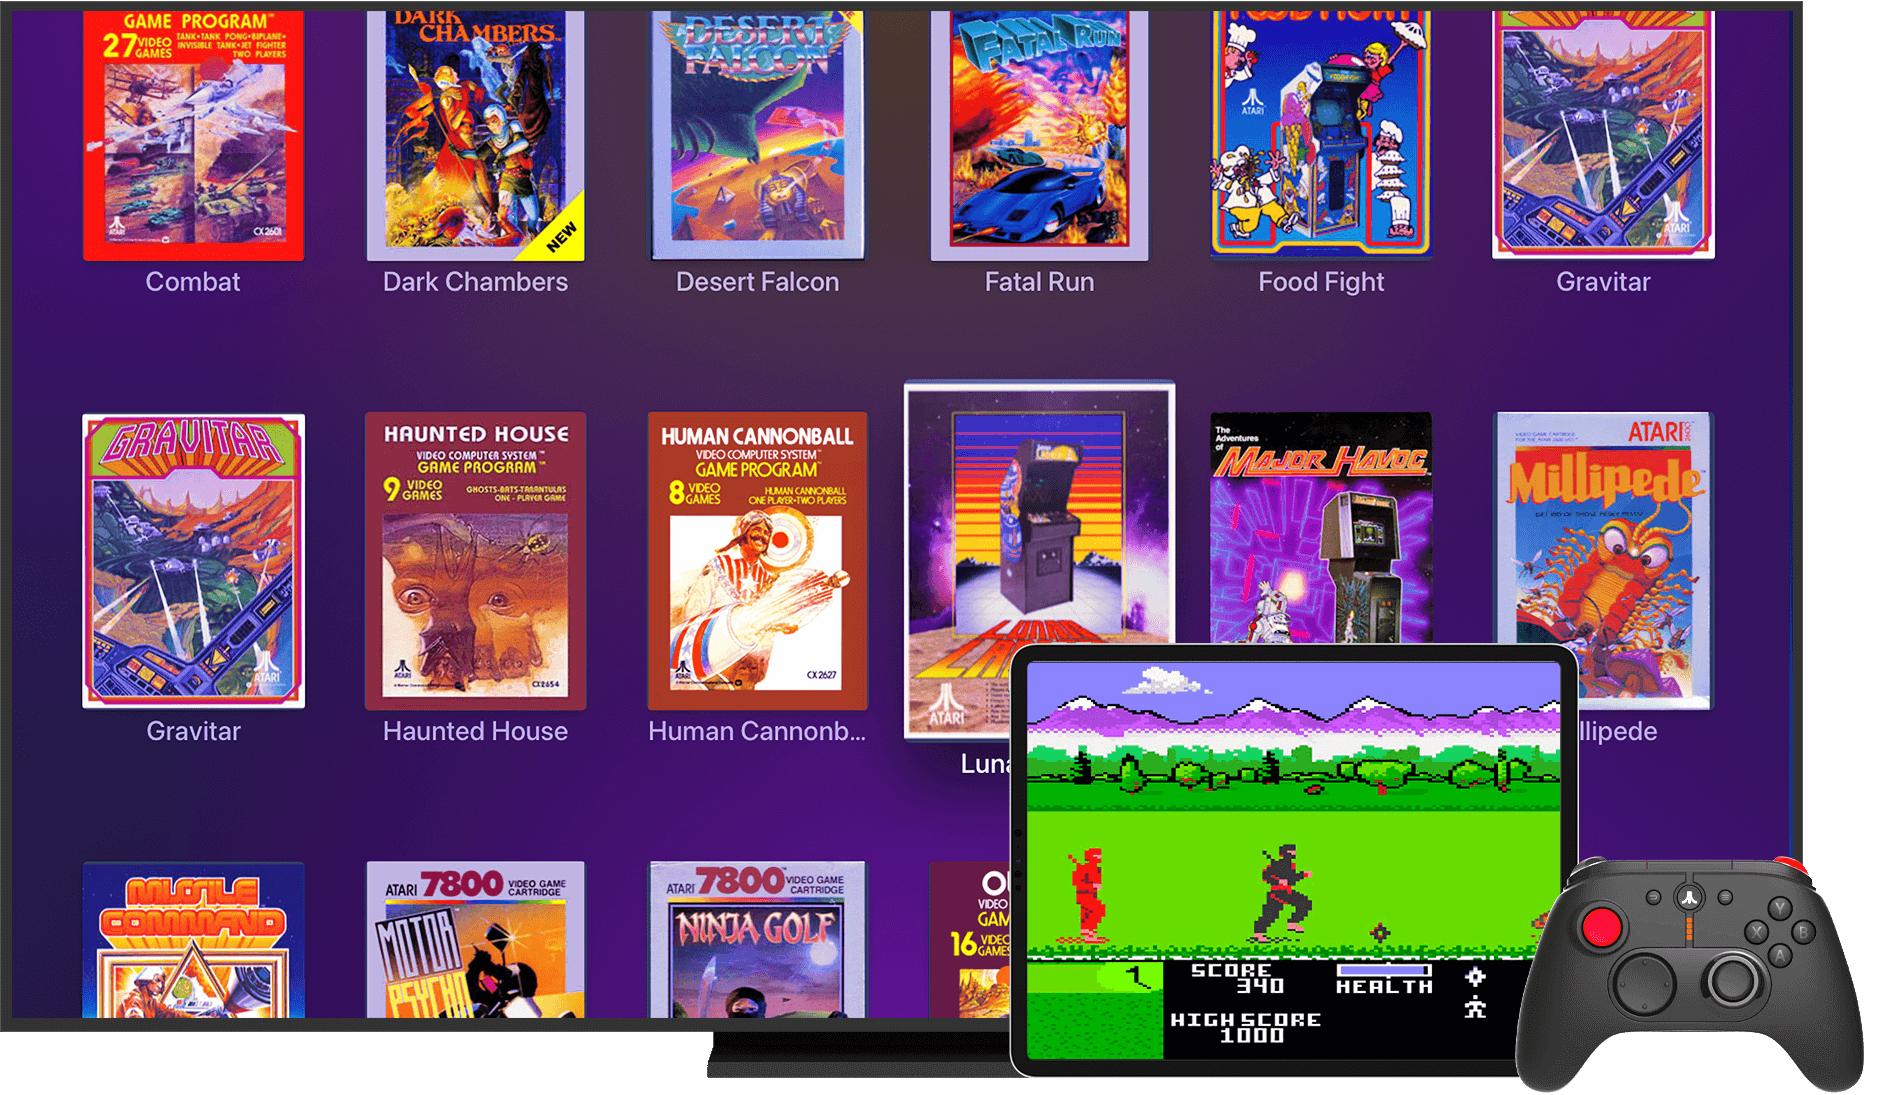 Plex's New Atari Retro Arcade Subscription Looks Awesome